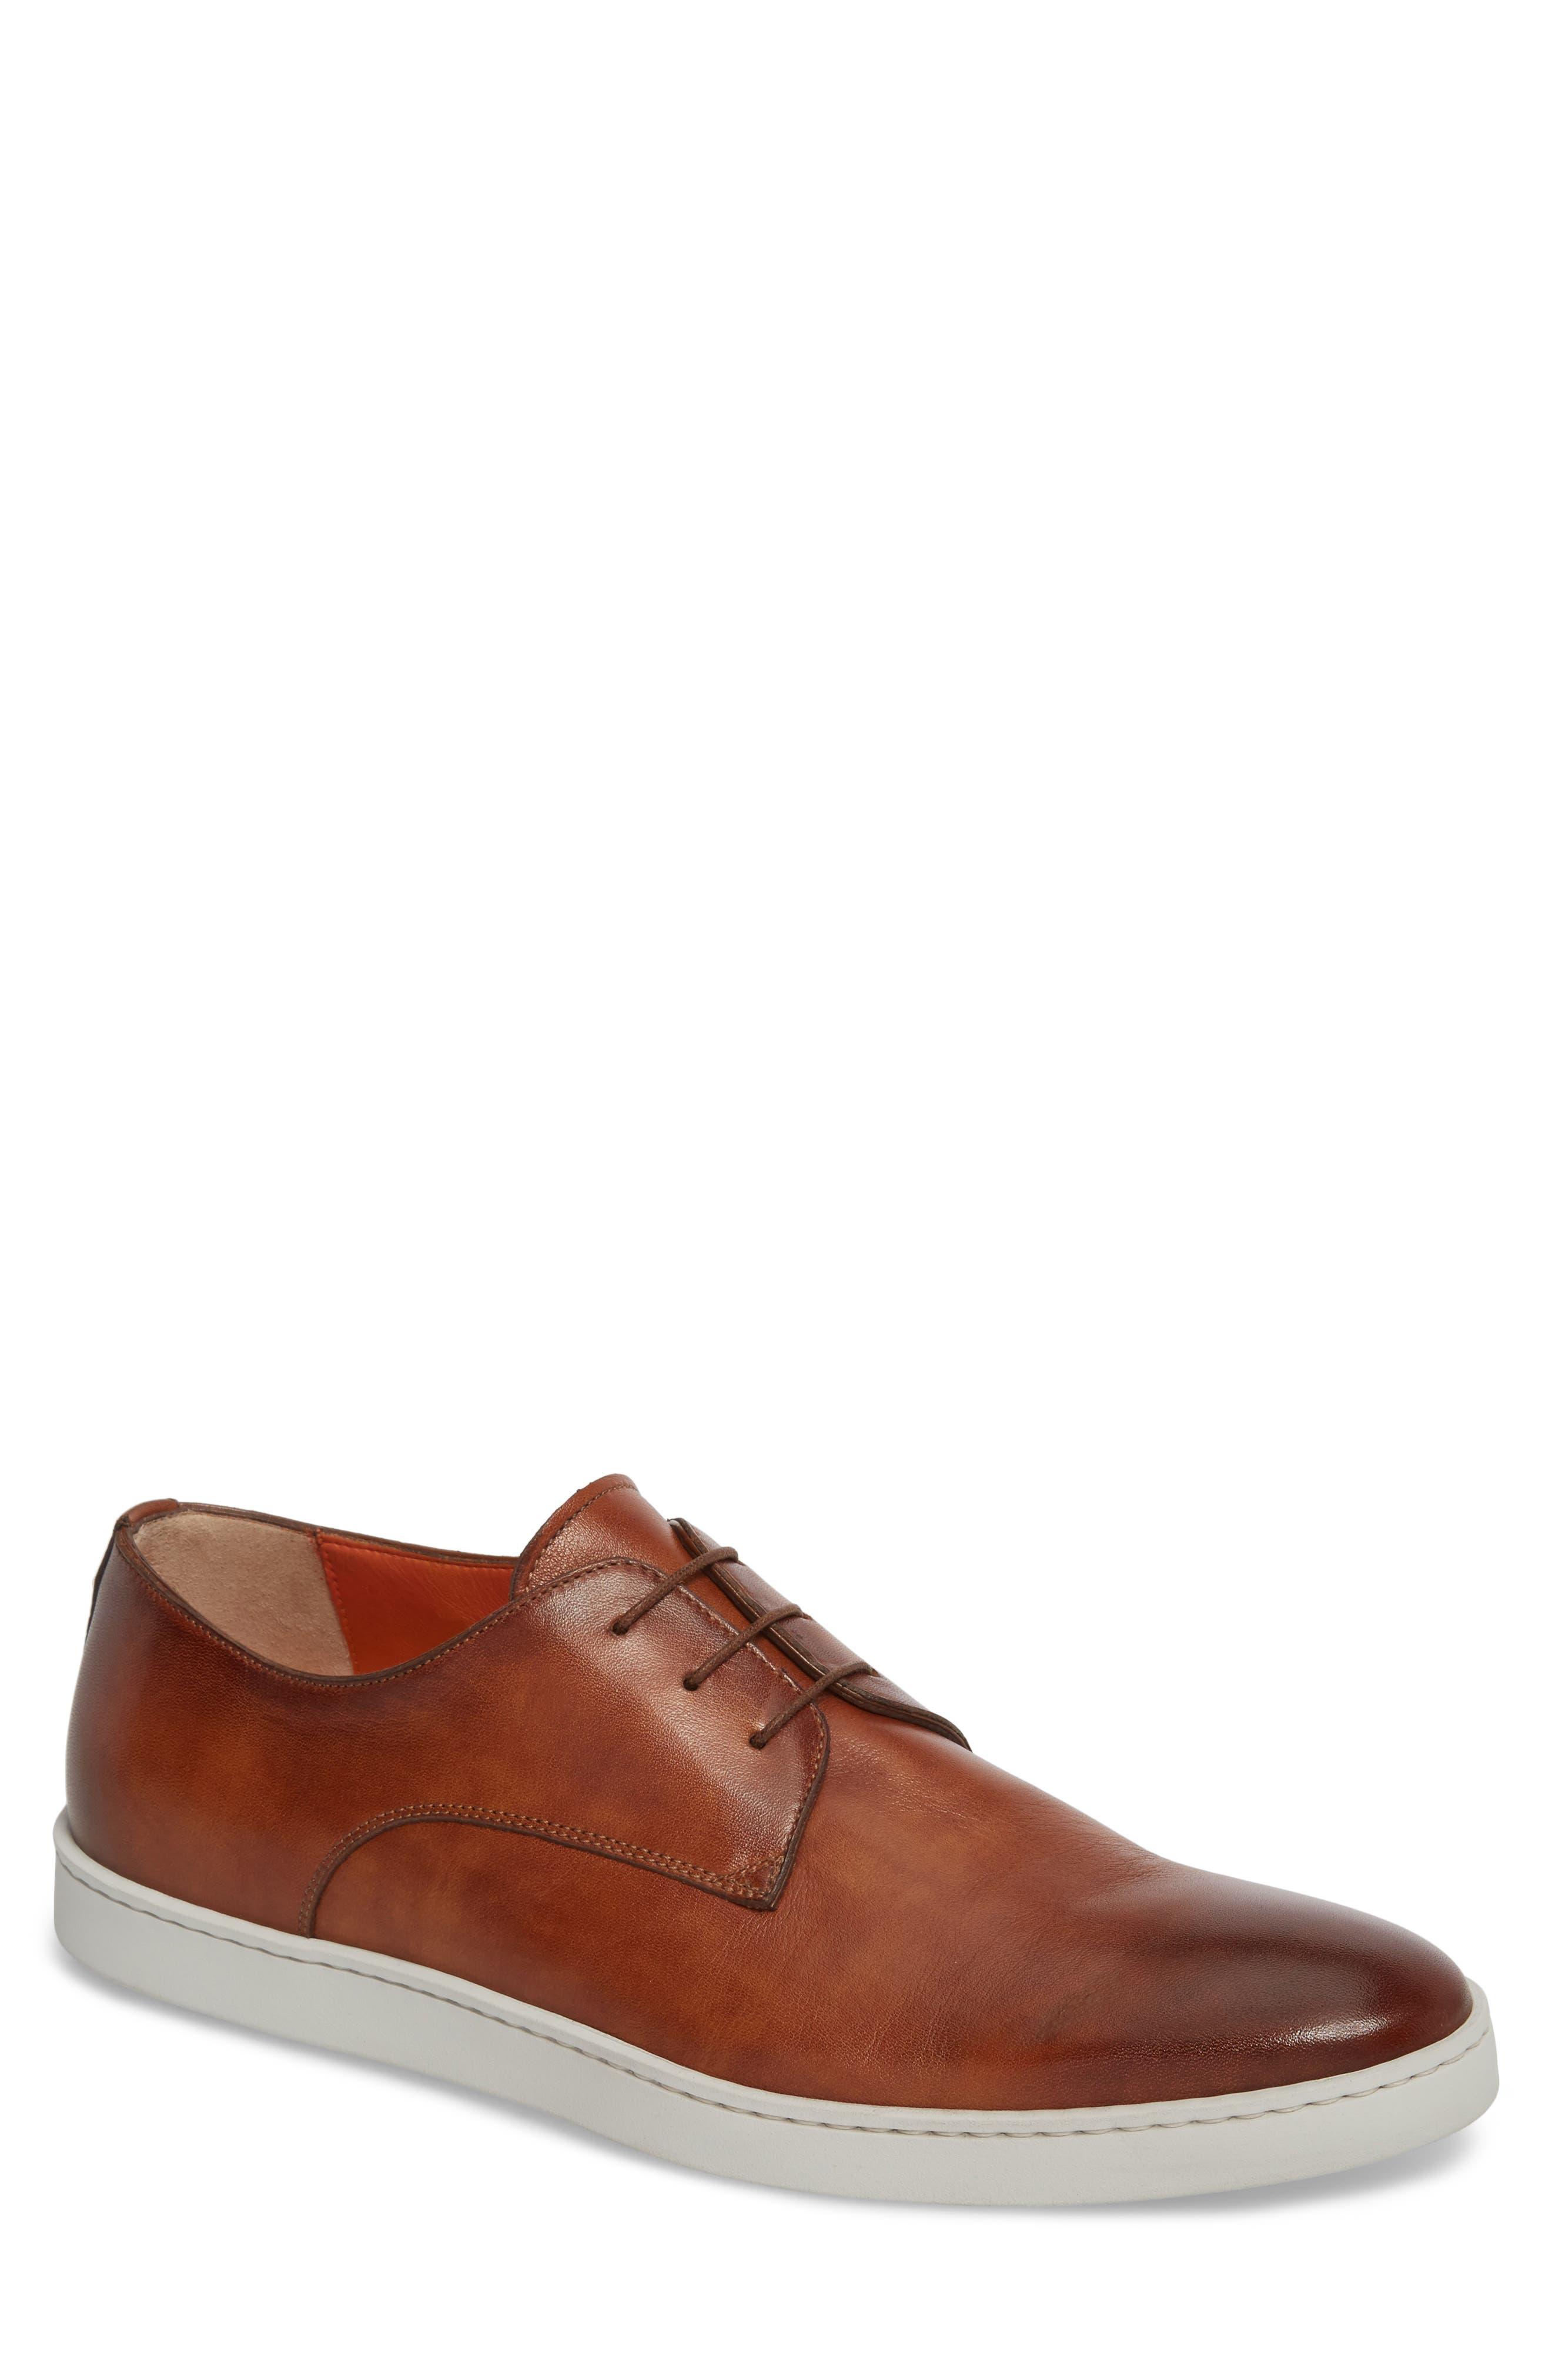 Doyle Plain Toe Derby Sneaker,                         Main,                         color, TAN